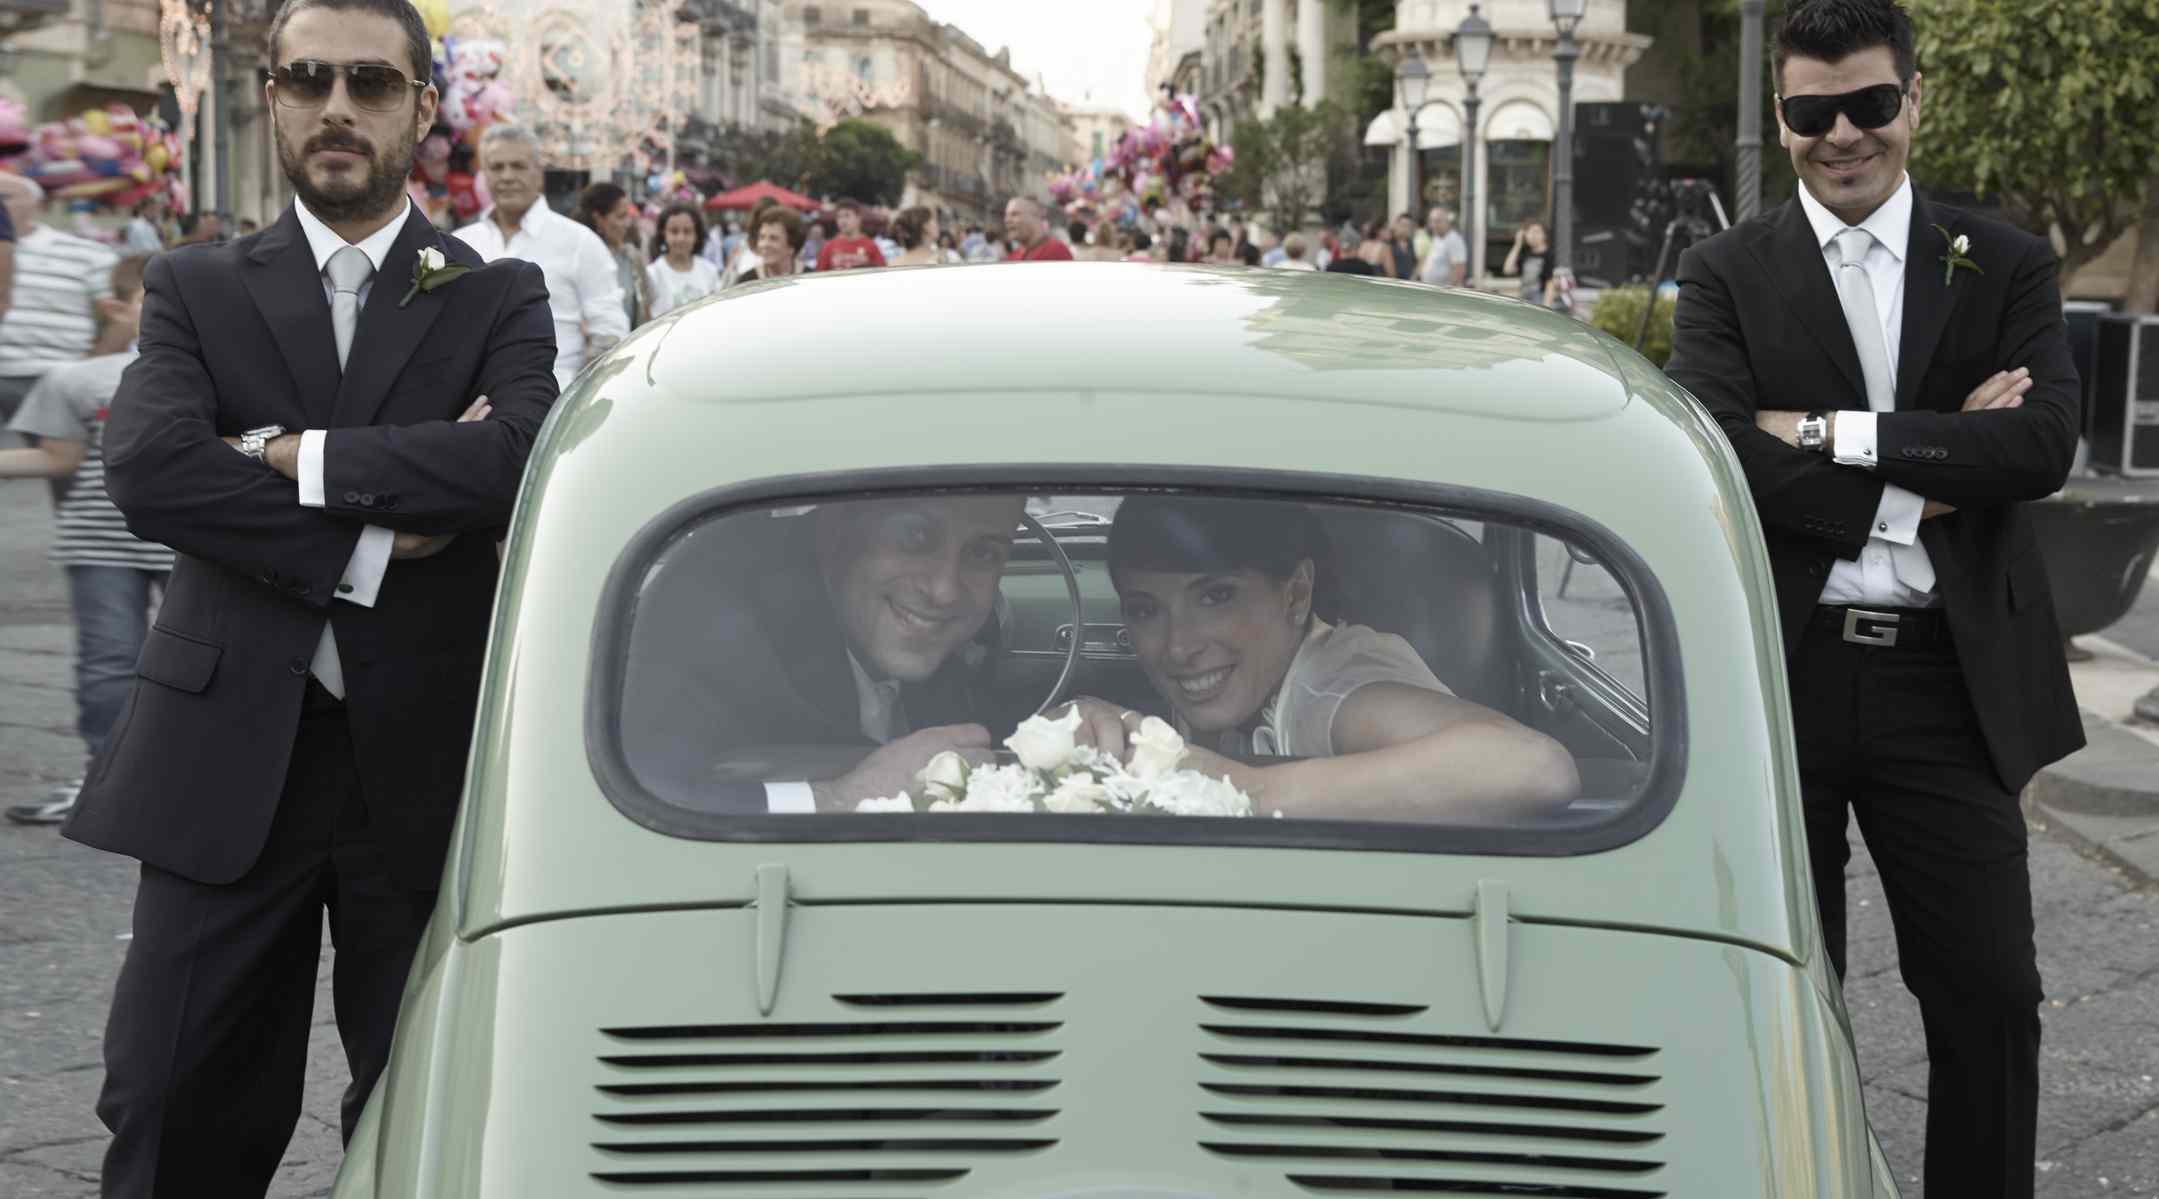 giovanni_ruggeri_fotografo_catania_sicily_wedding_matrimonio_9